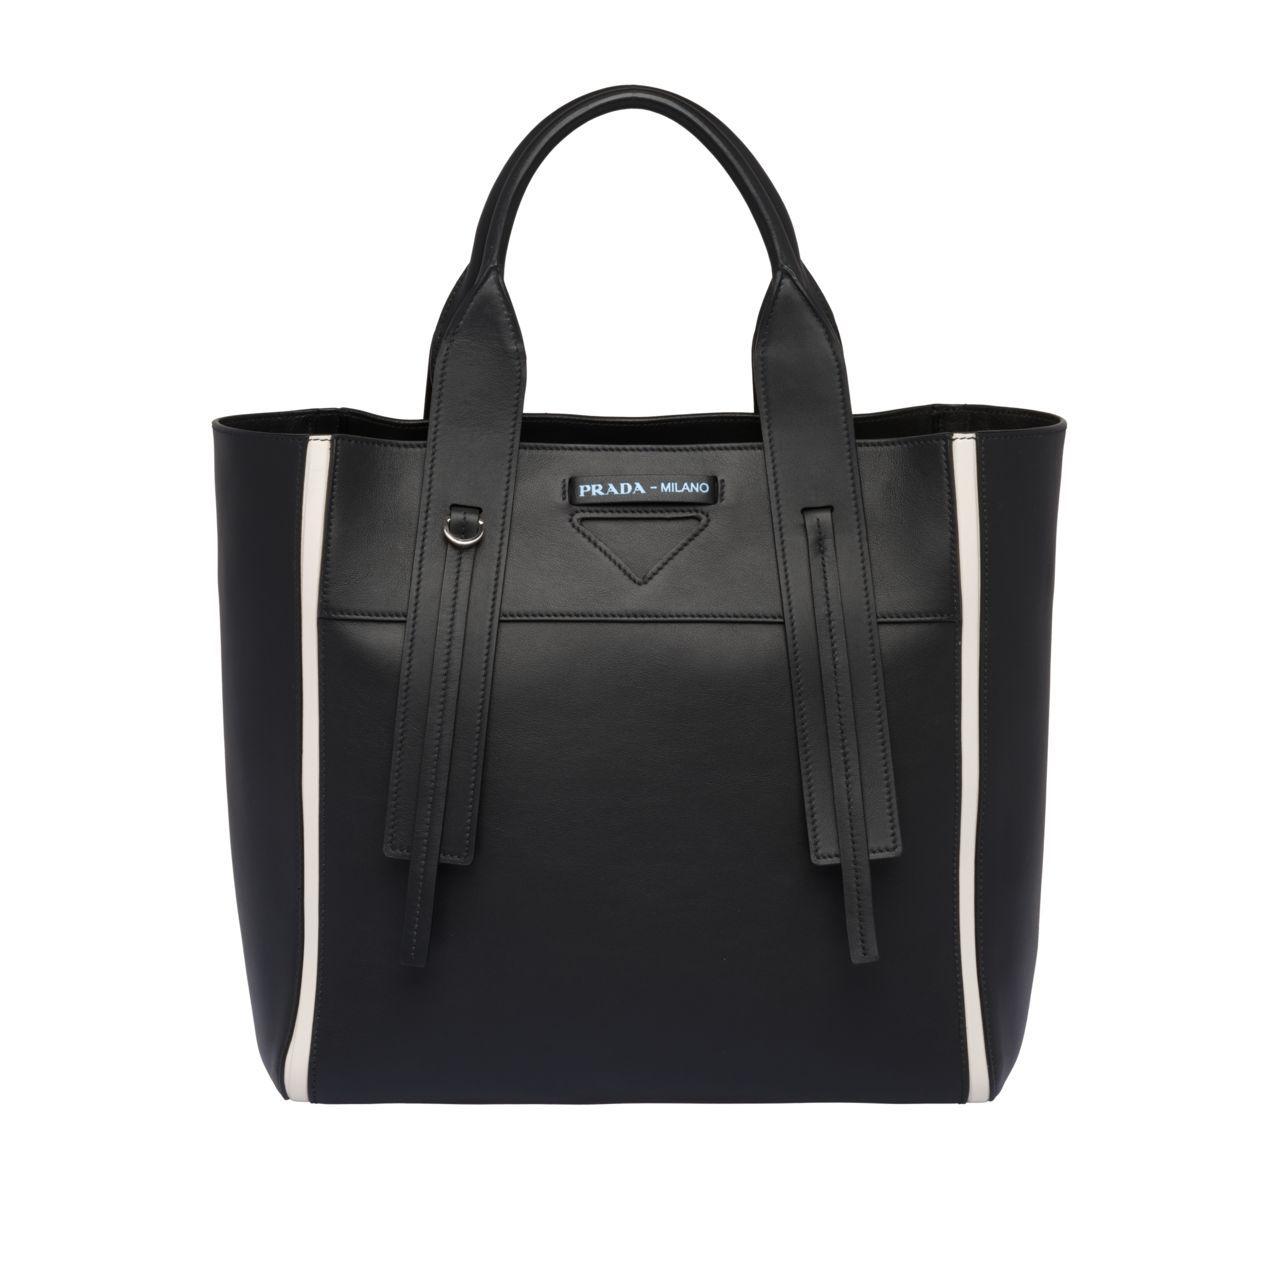 9160cbd8b6b9f5 Borsa Prada Ouverture medium in pelle in 2019   BAGS   Bags, Fashion ...